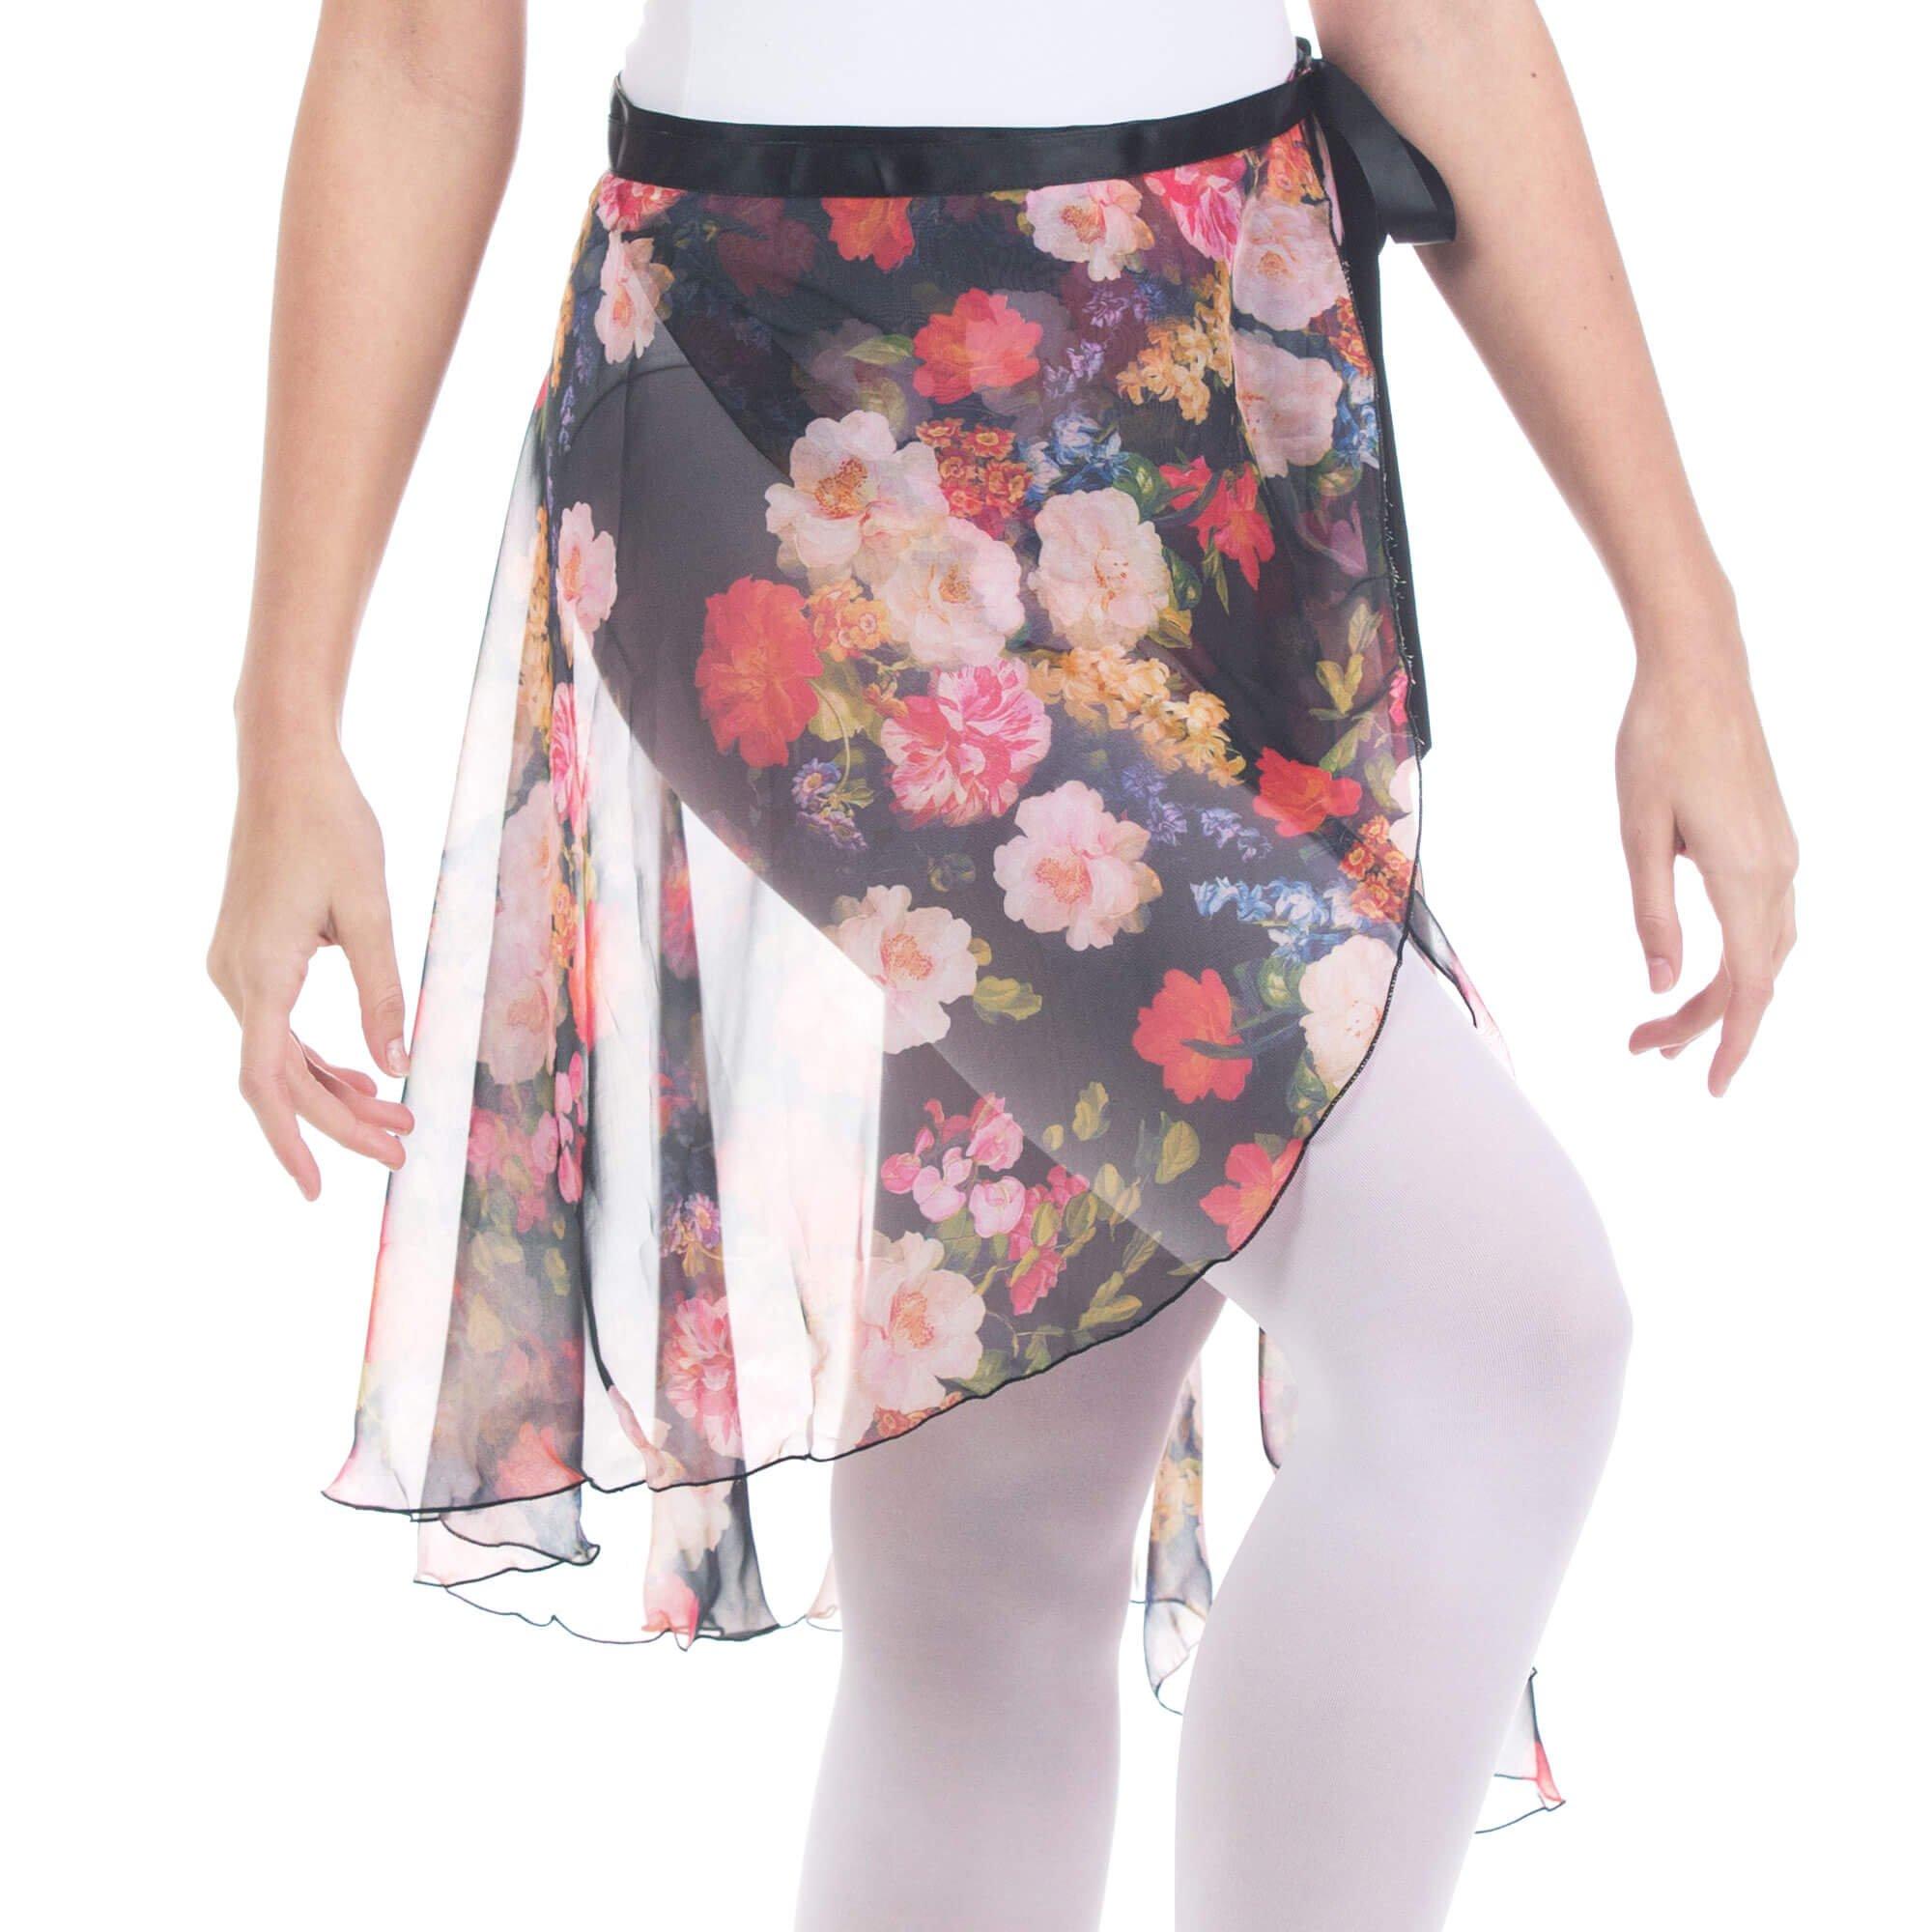 698dab4855863 Baiwu Women s Flower Print Chiffon Midi Wrap Skirt